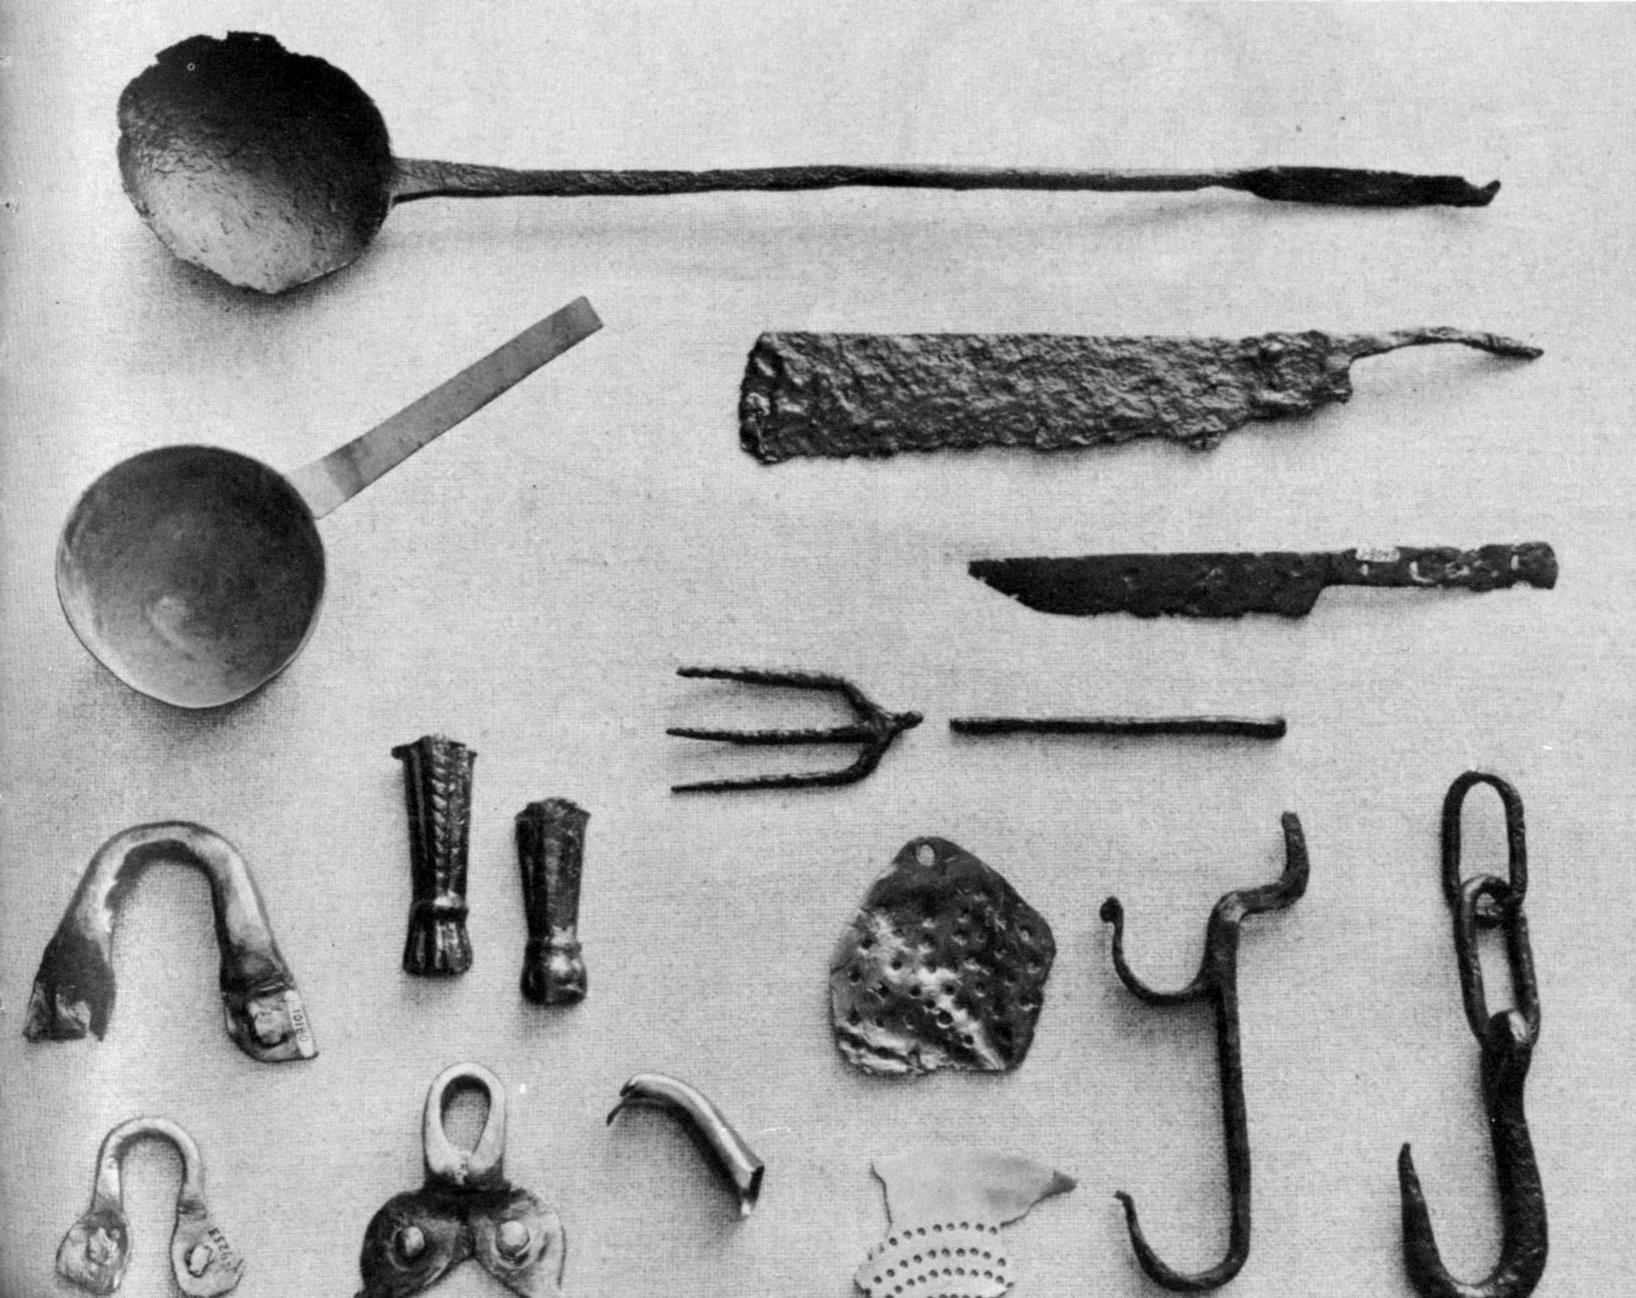 Antique Kitchen Knives Uk